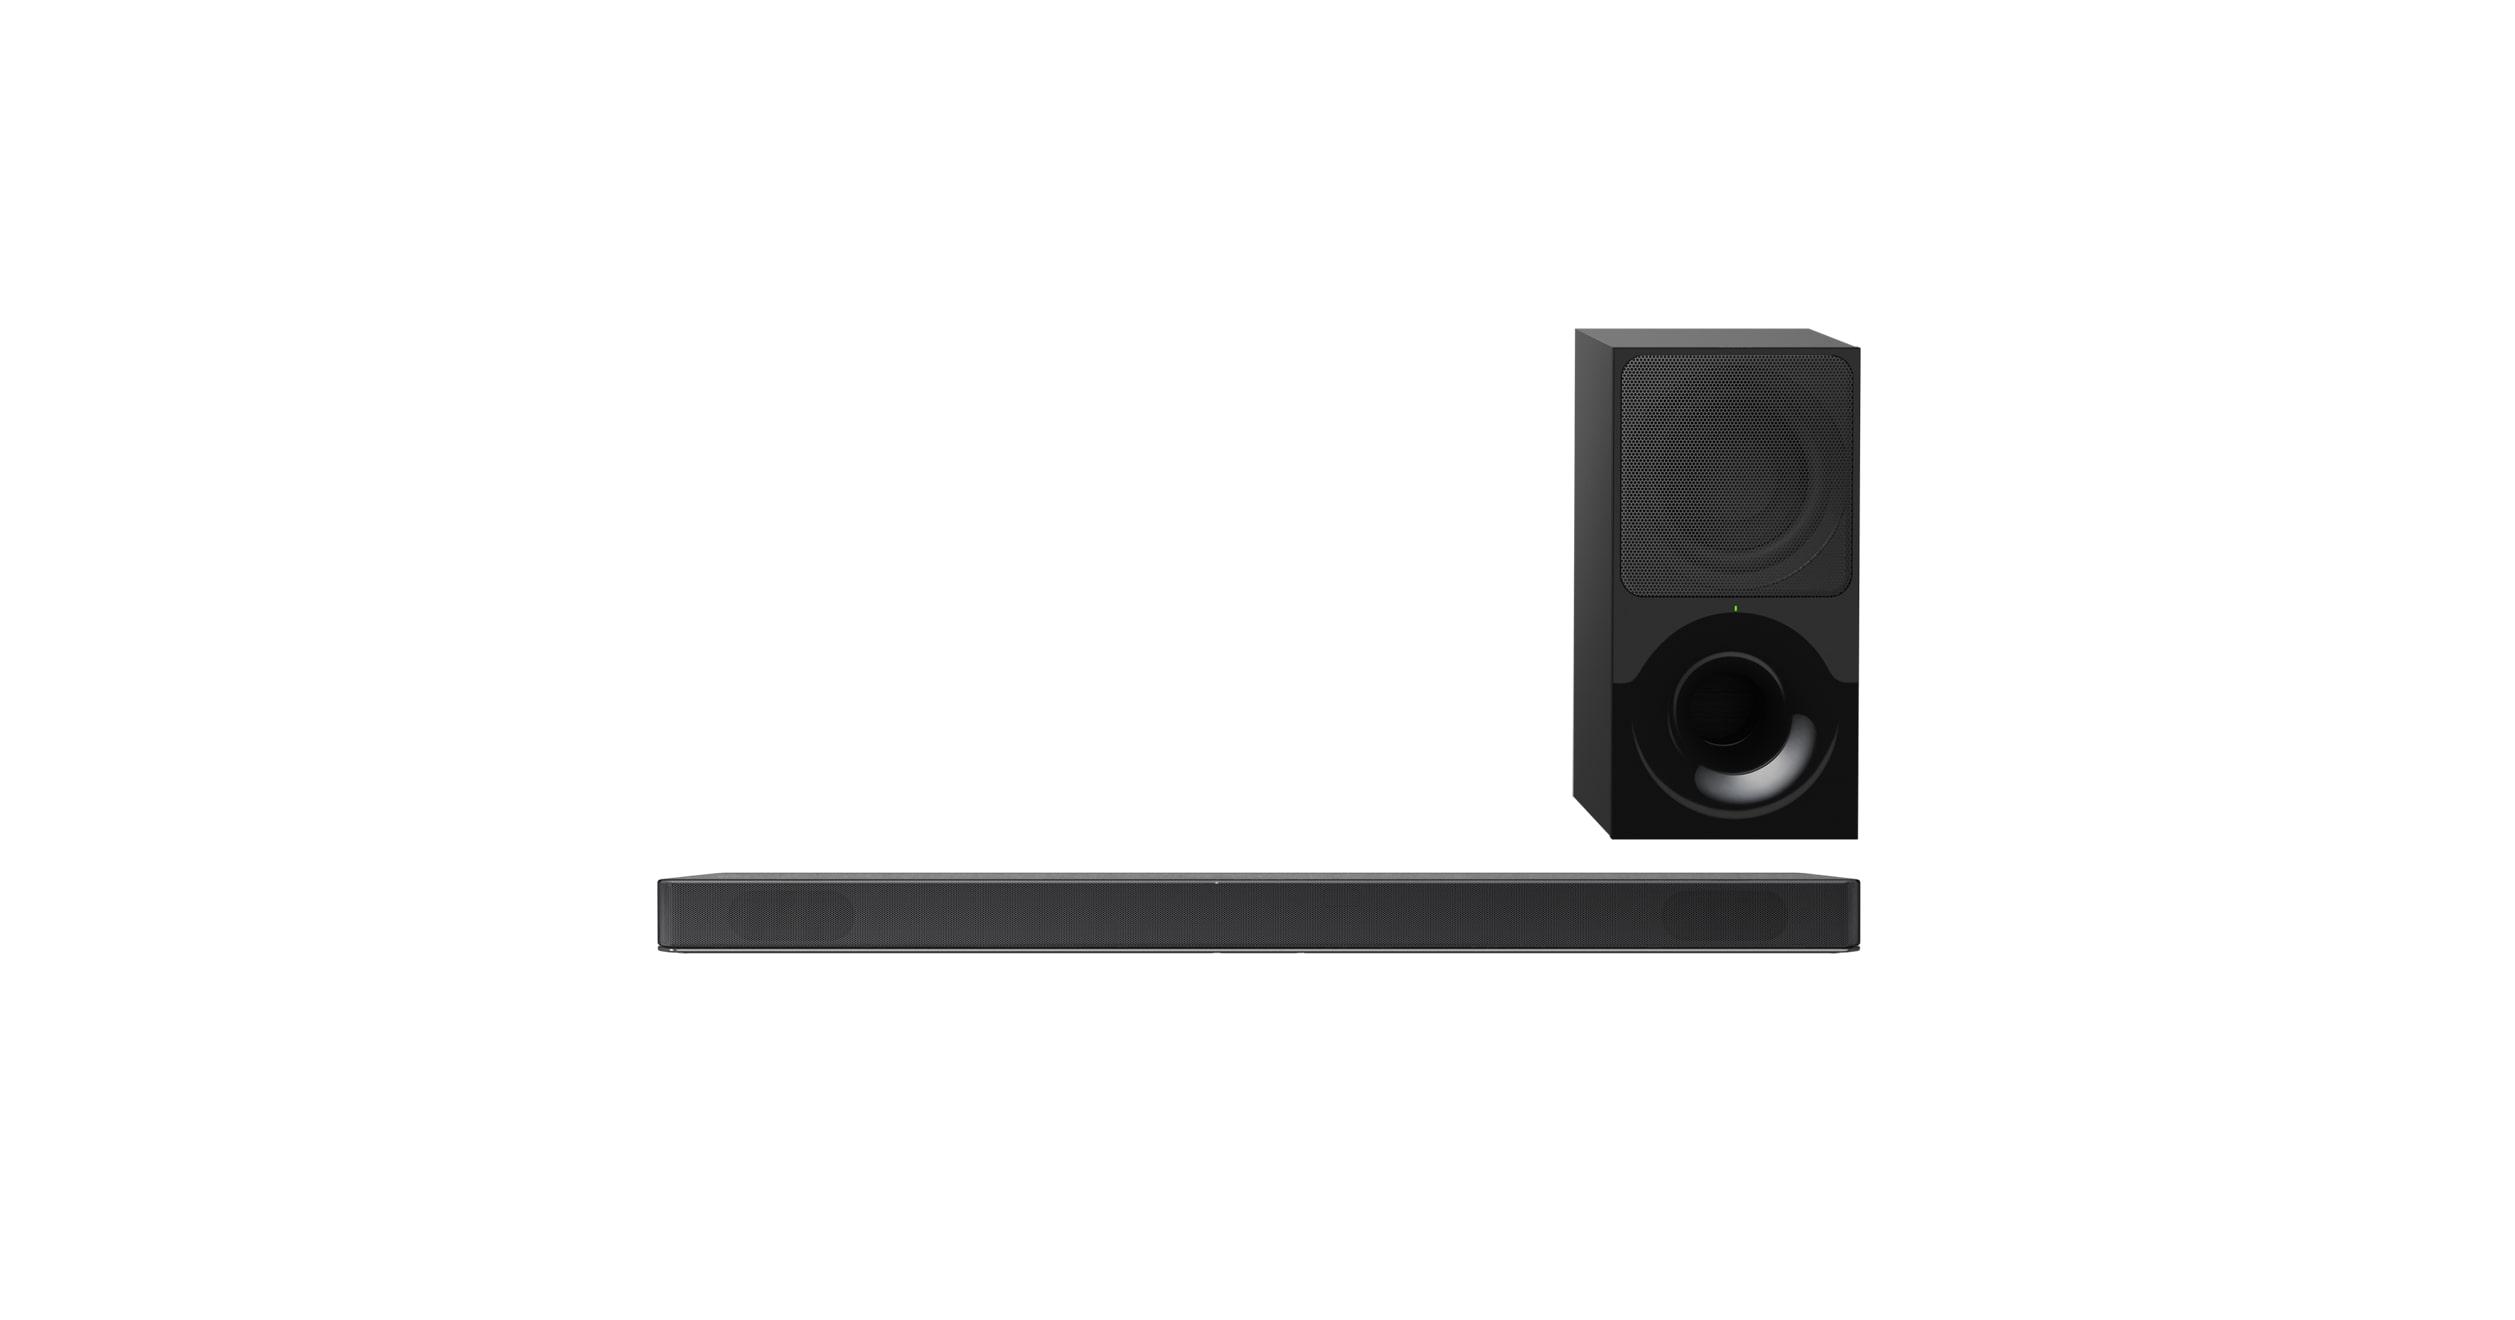 Sony 2 1ch Dolby Atmos® / DTS:X™ Soundbar with Bluetooth® technology |  HT-X9000F